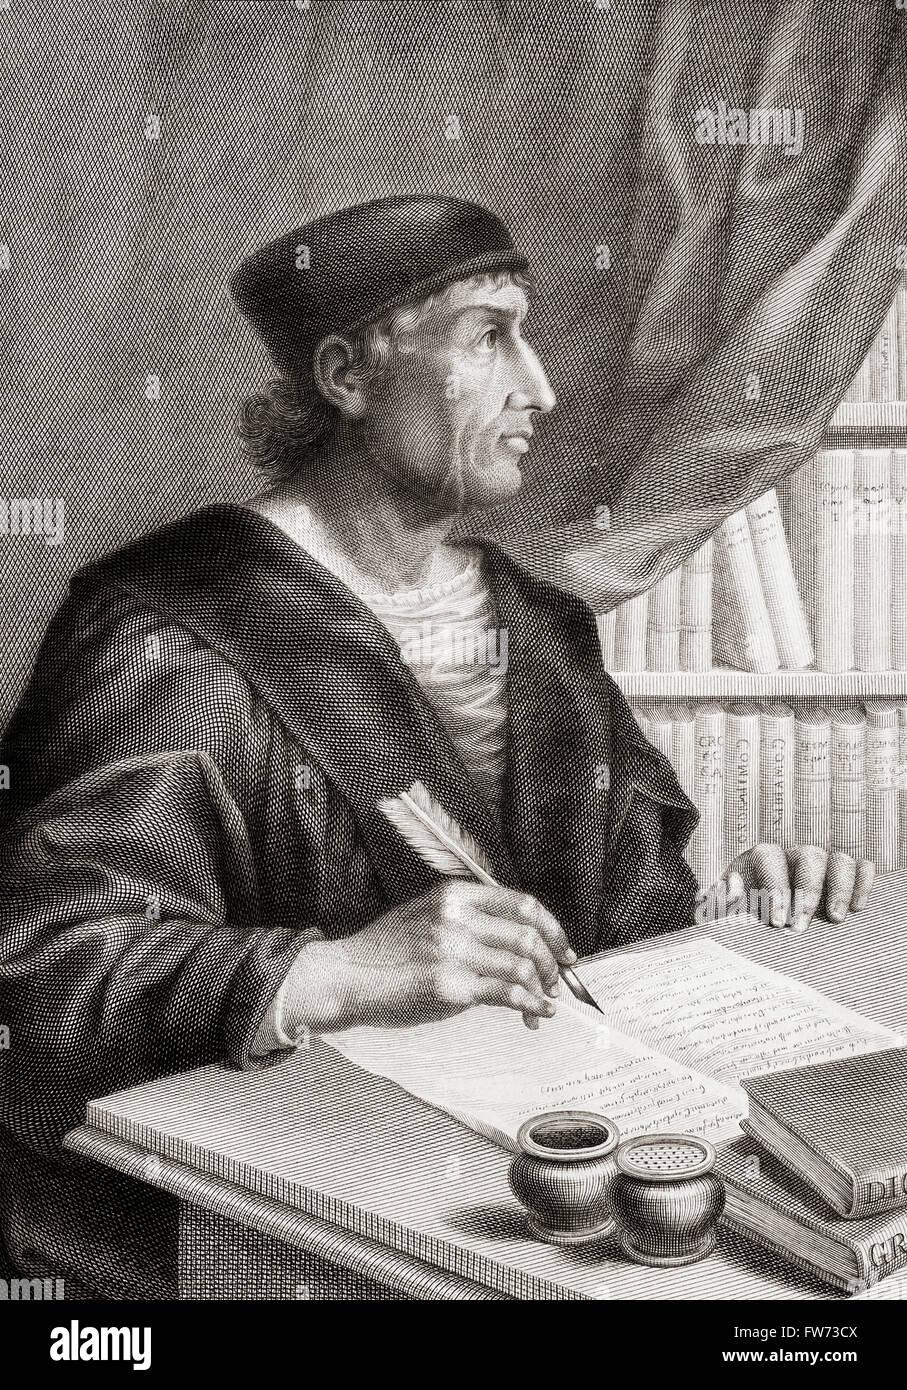 Antonio de Nebrija, 1441-1522.  Spanish scholar, historian, teacher and poet.  Amongst his achievements was writing Stock Photo